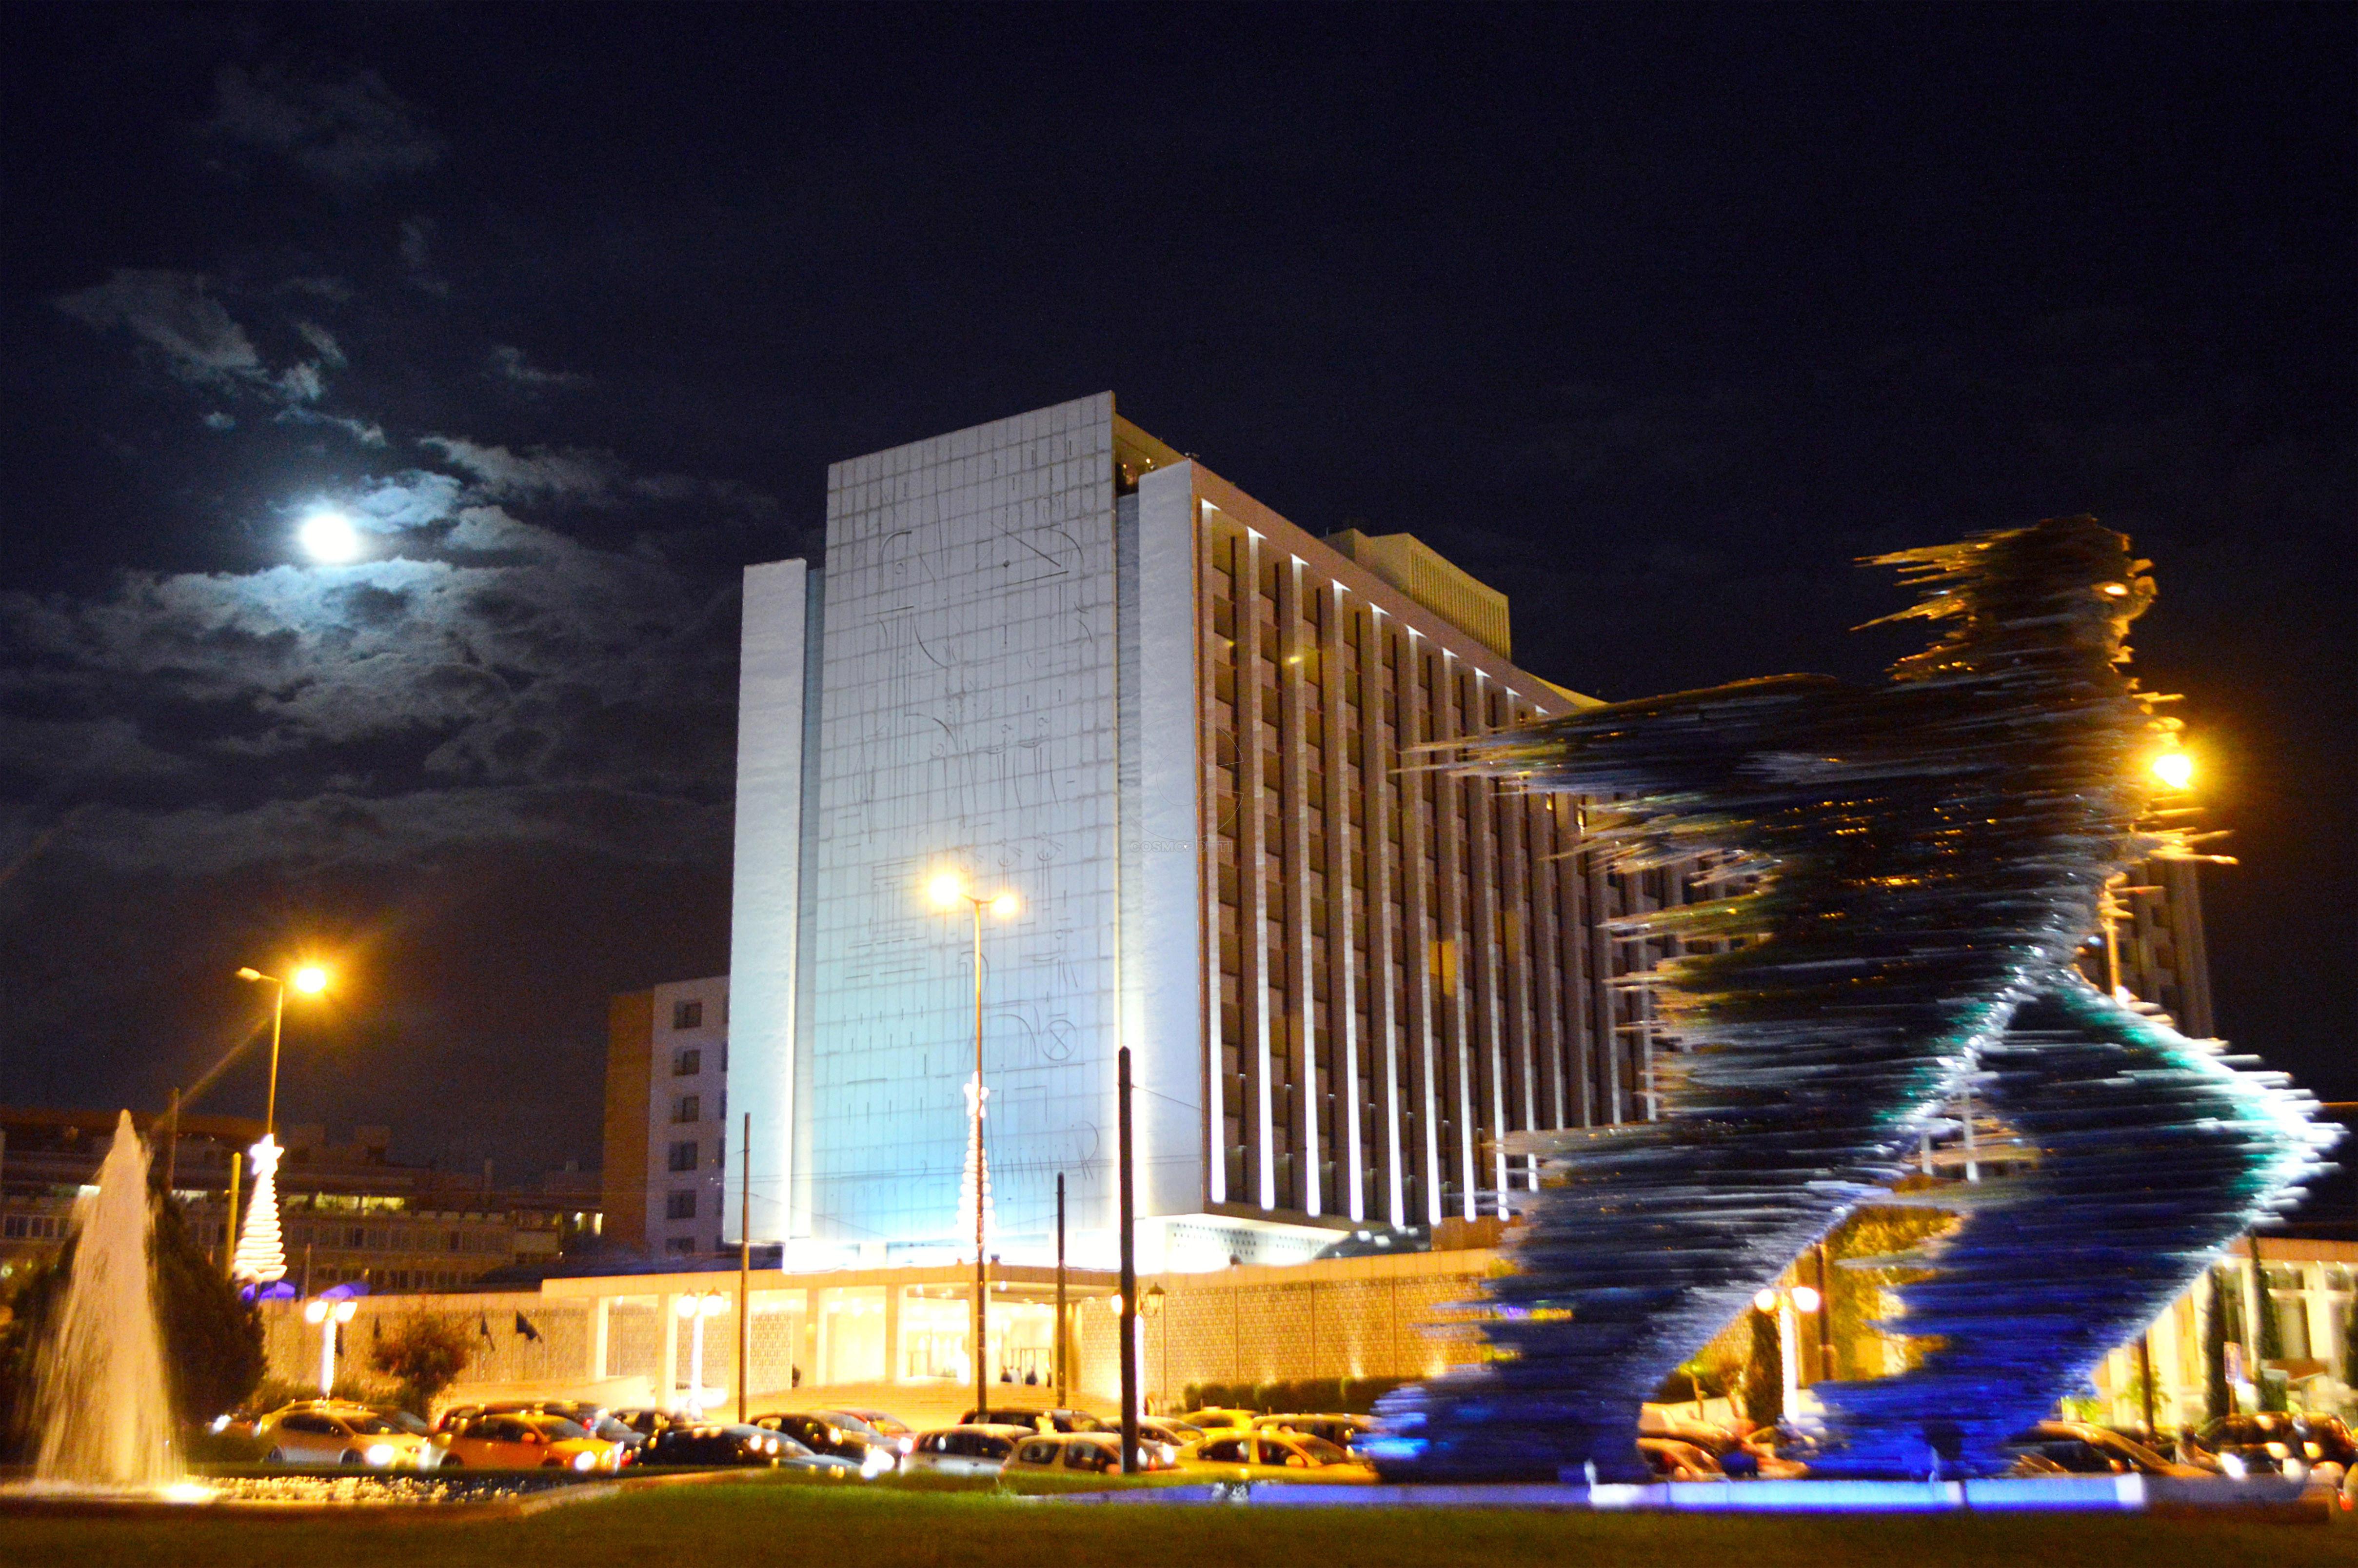 Hilton_Athens_Exterior